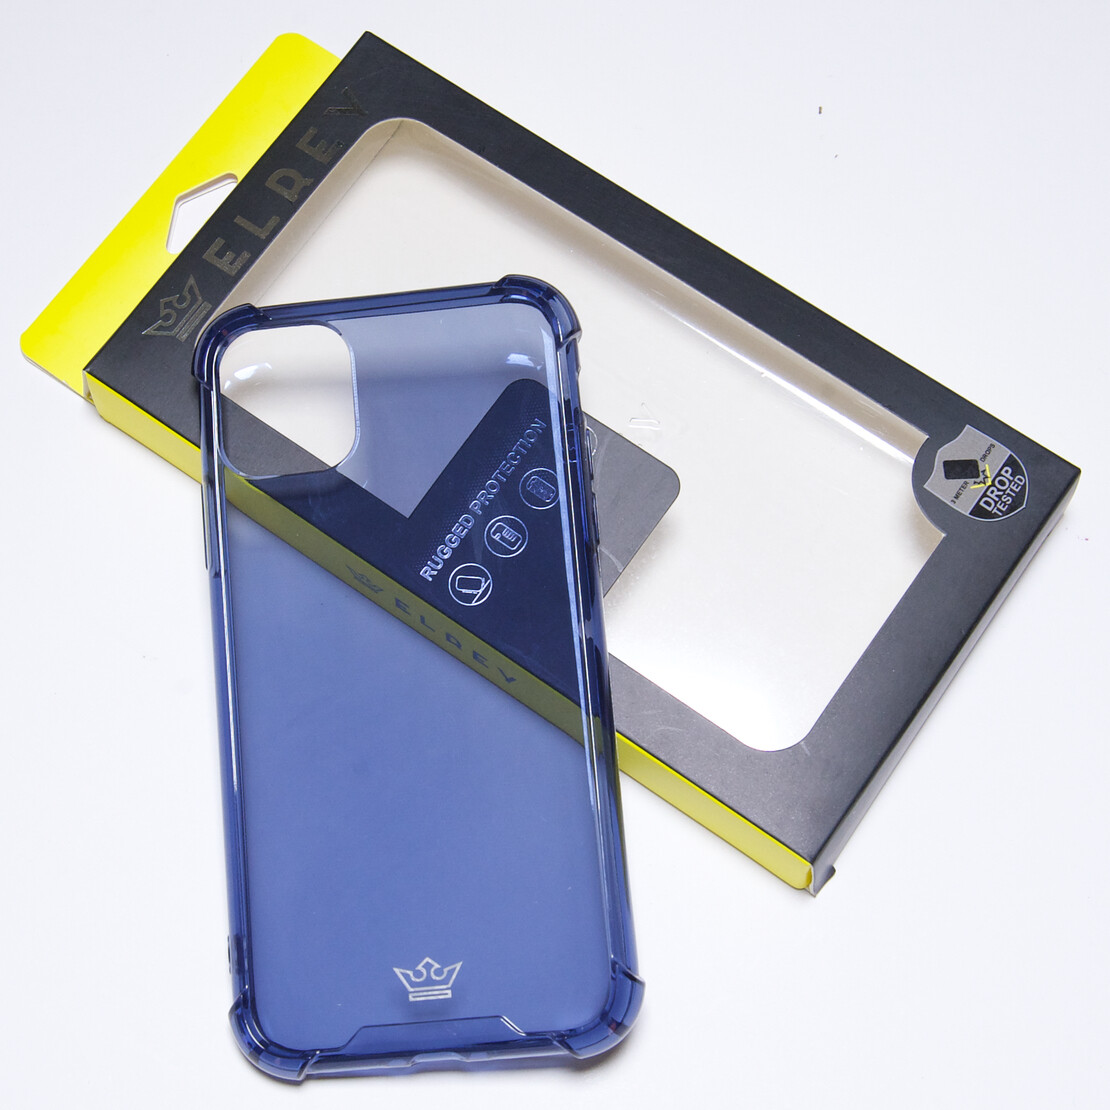 Estuche EL REY Hard Case Flexible Reforzado Azul Marino  Iphone 11 Pro Max